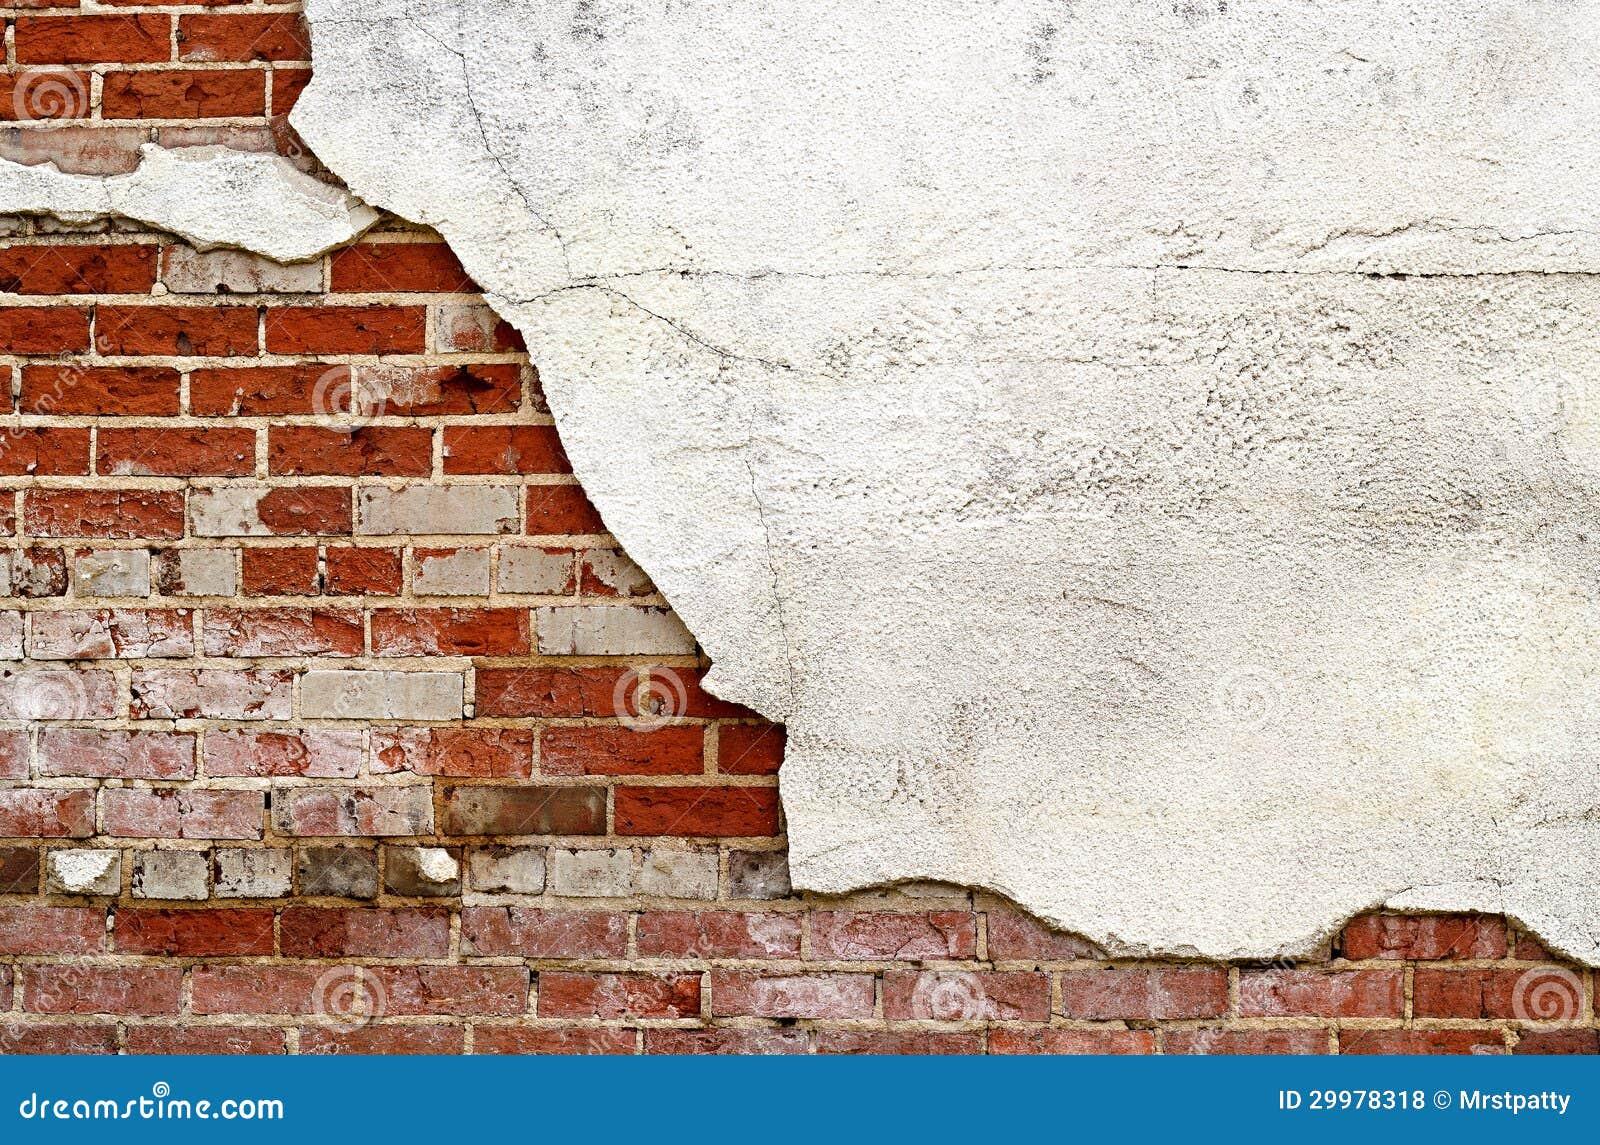 Brick And Stucco Wall Royalty Free Stock Photos Image 29978318